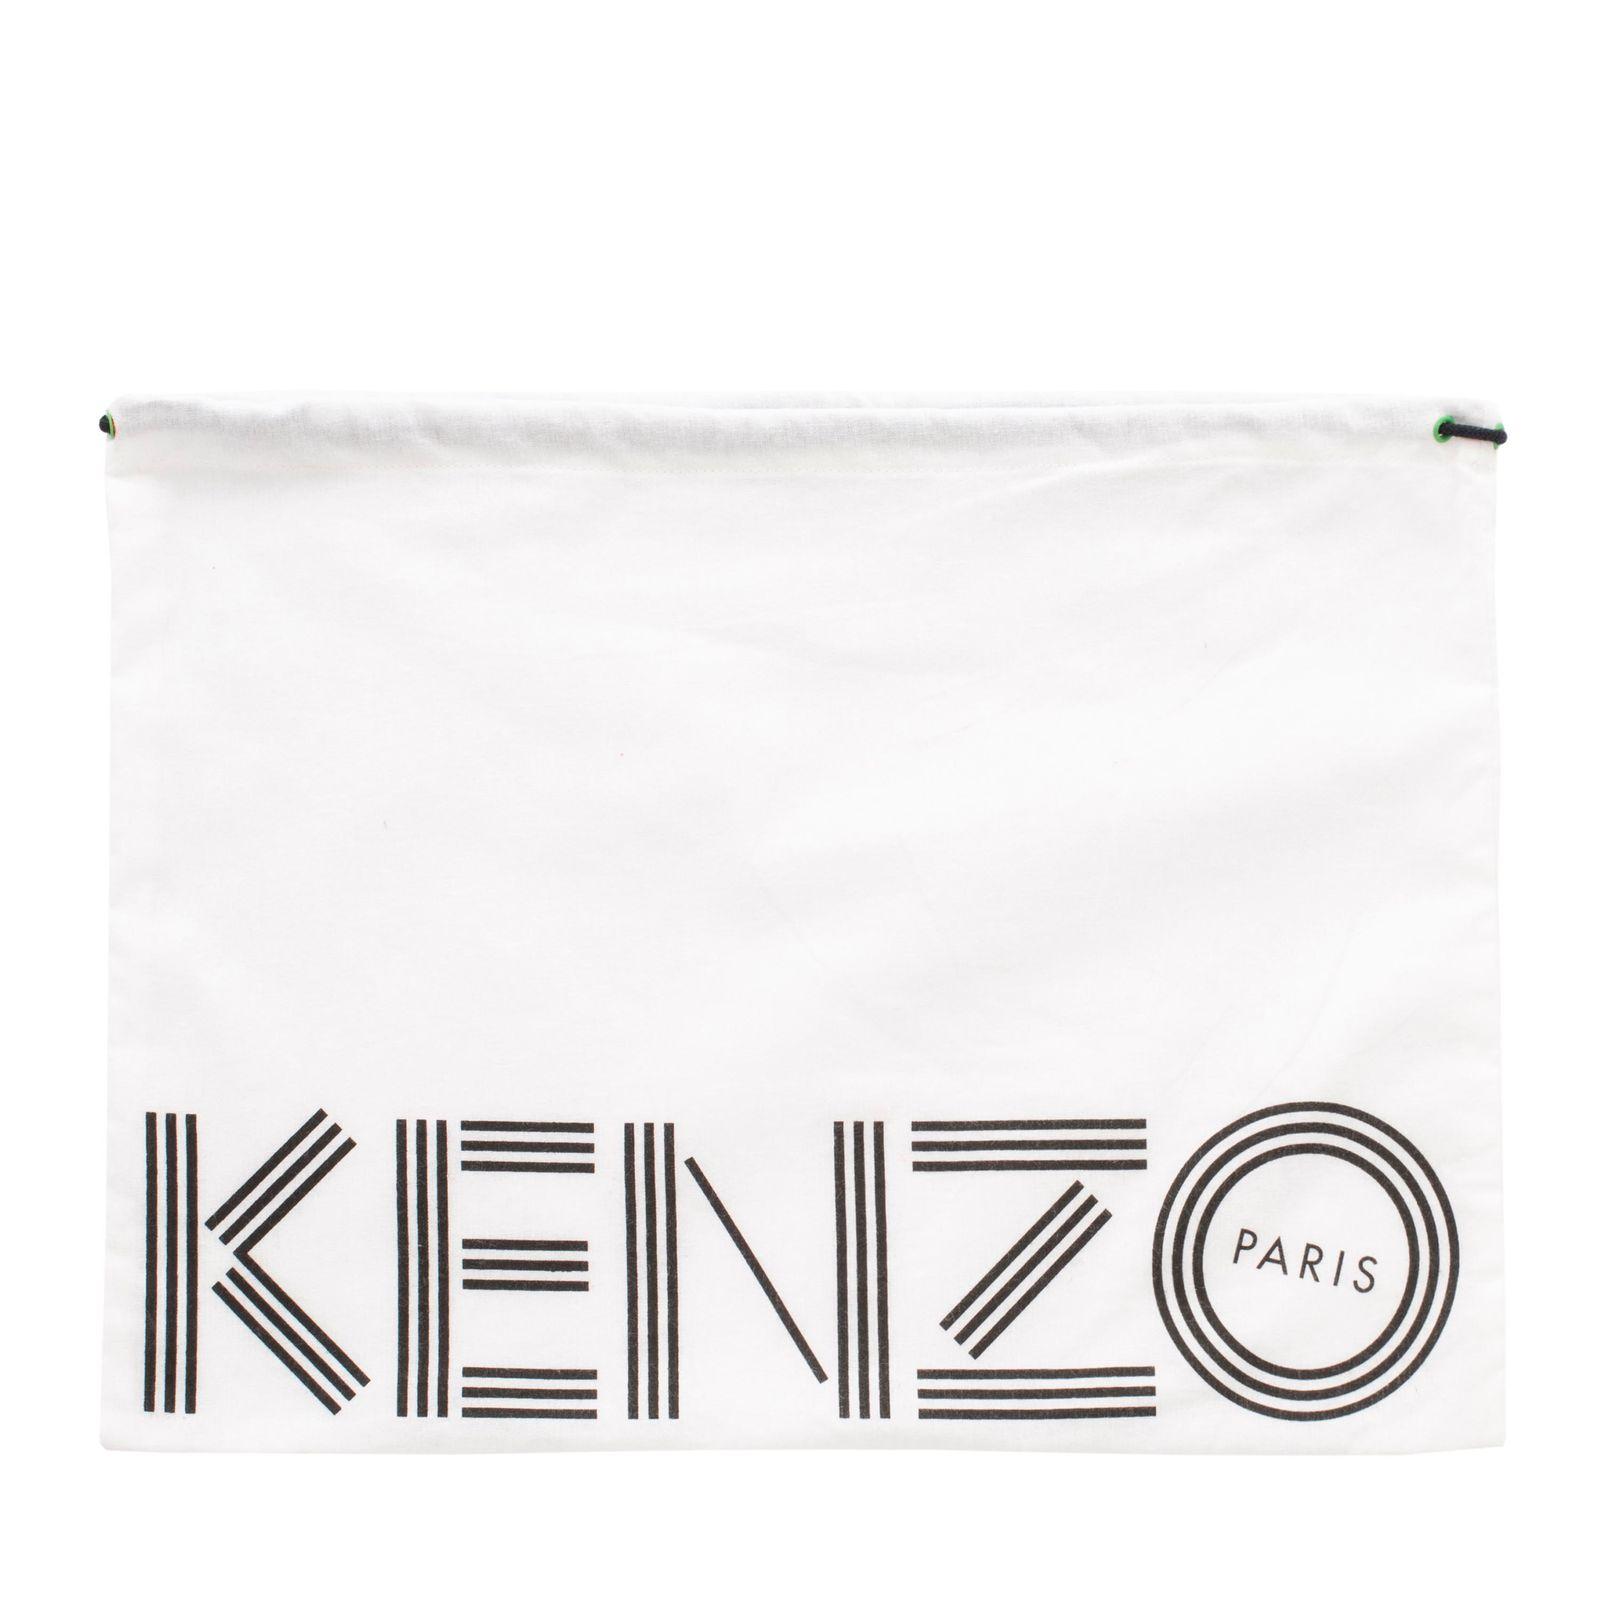 b030e1a63b361 Torebka k-bag ze skóry KENZO – Kup Teraz! Najlepsze ceny i opinie ...